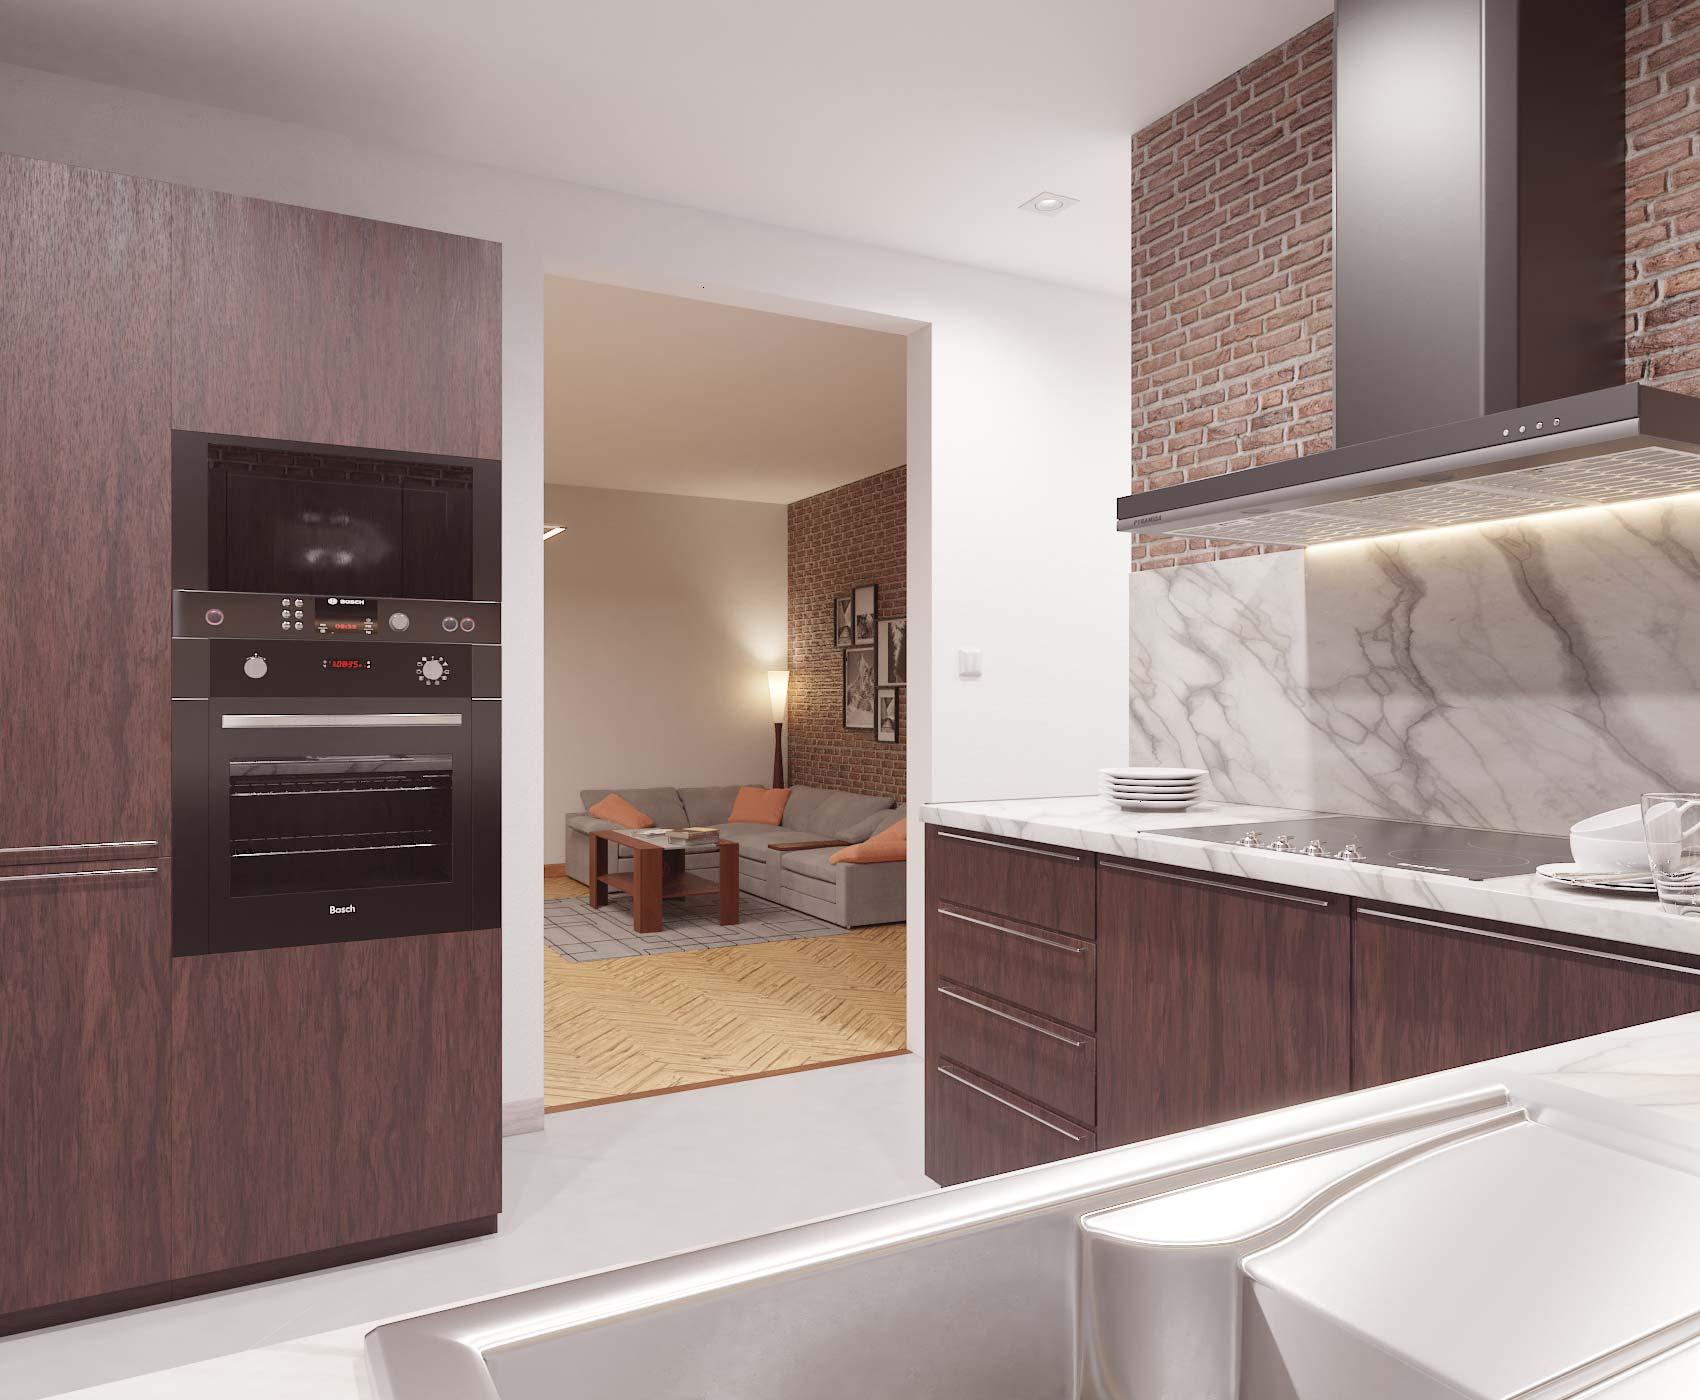 idea3d - vizualizácia kuchyňa 6